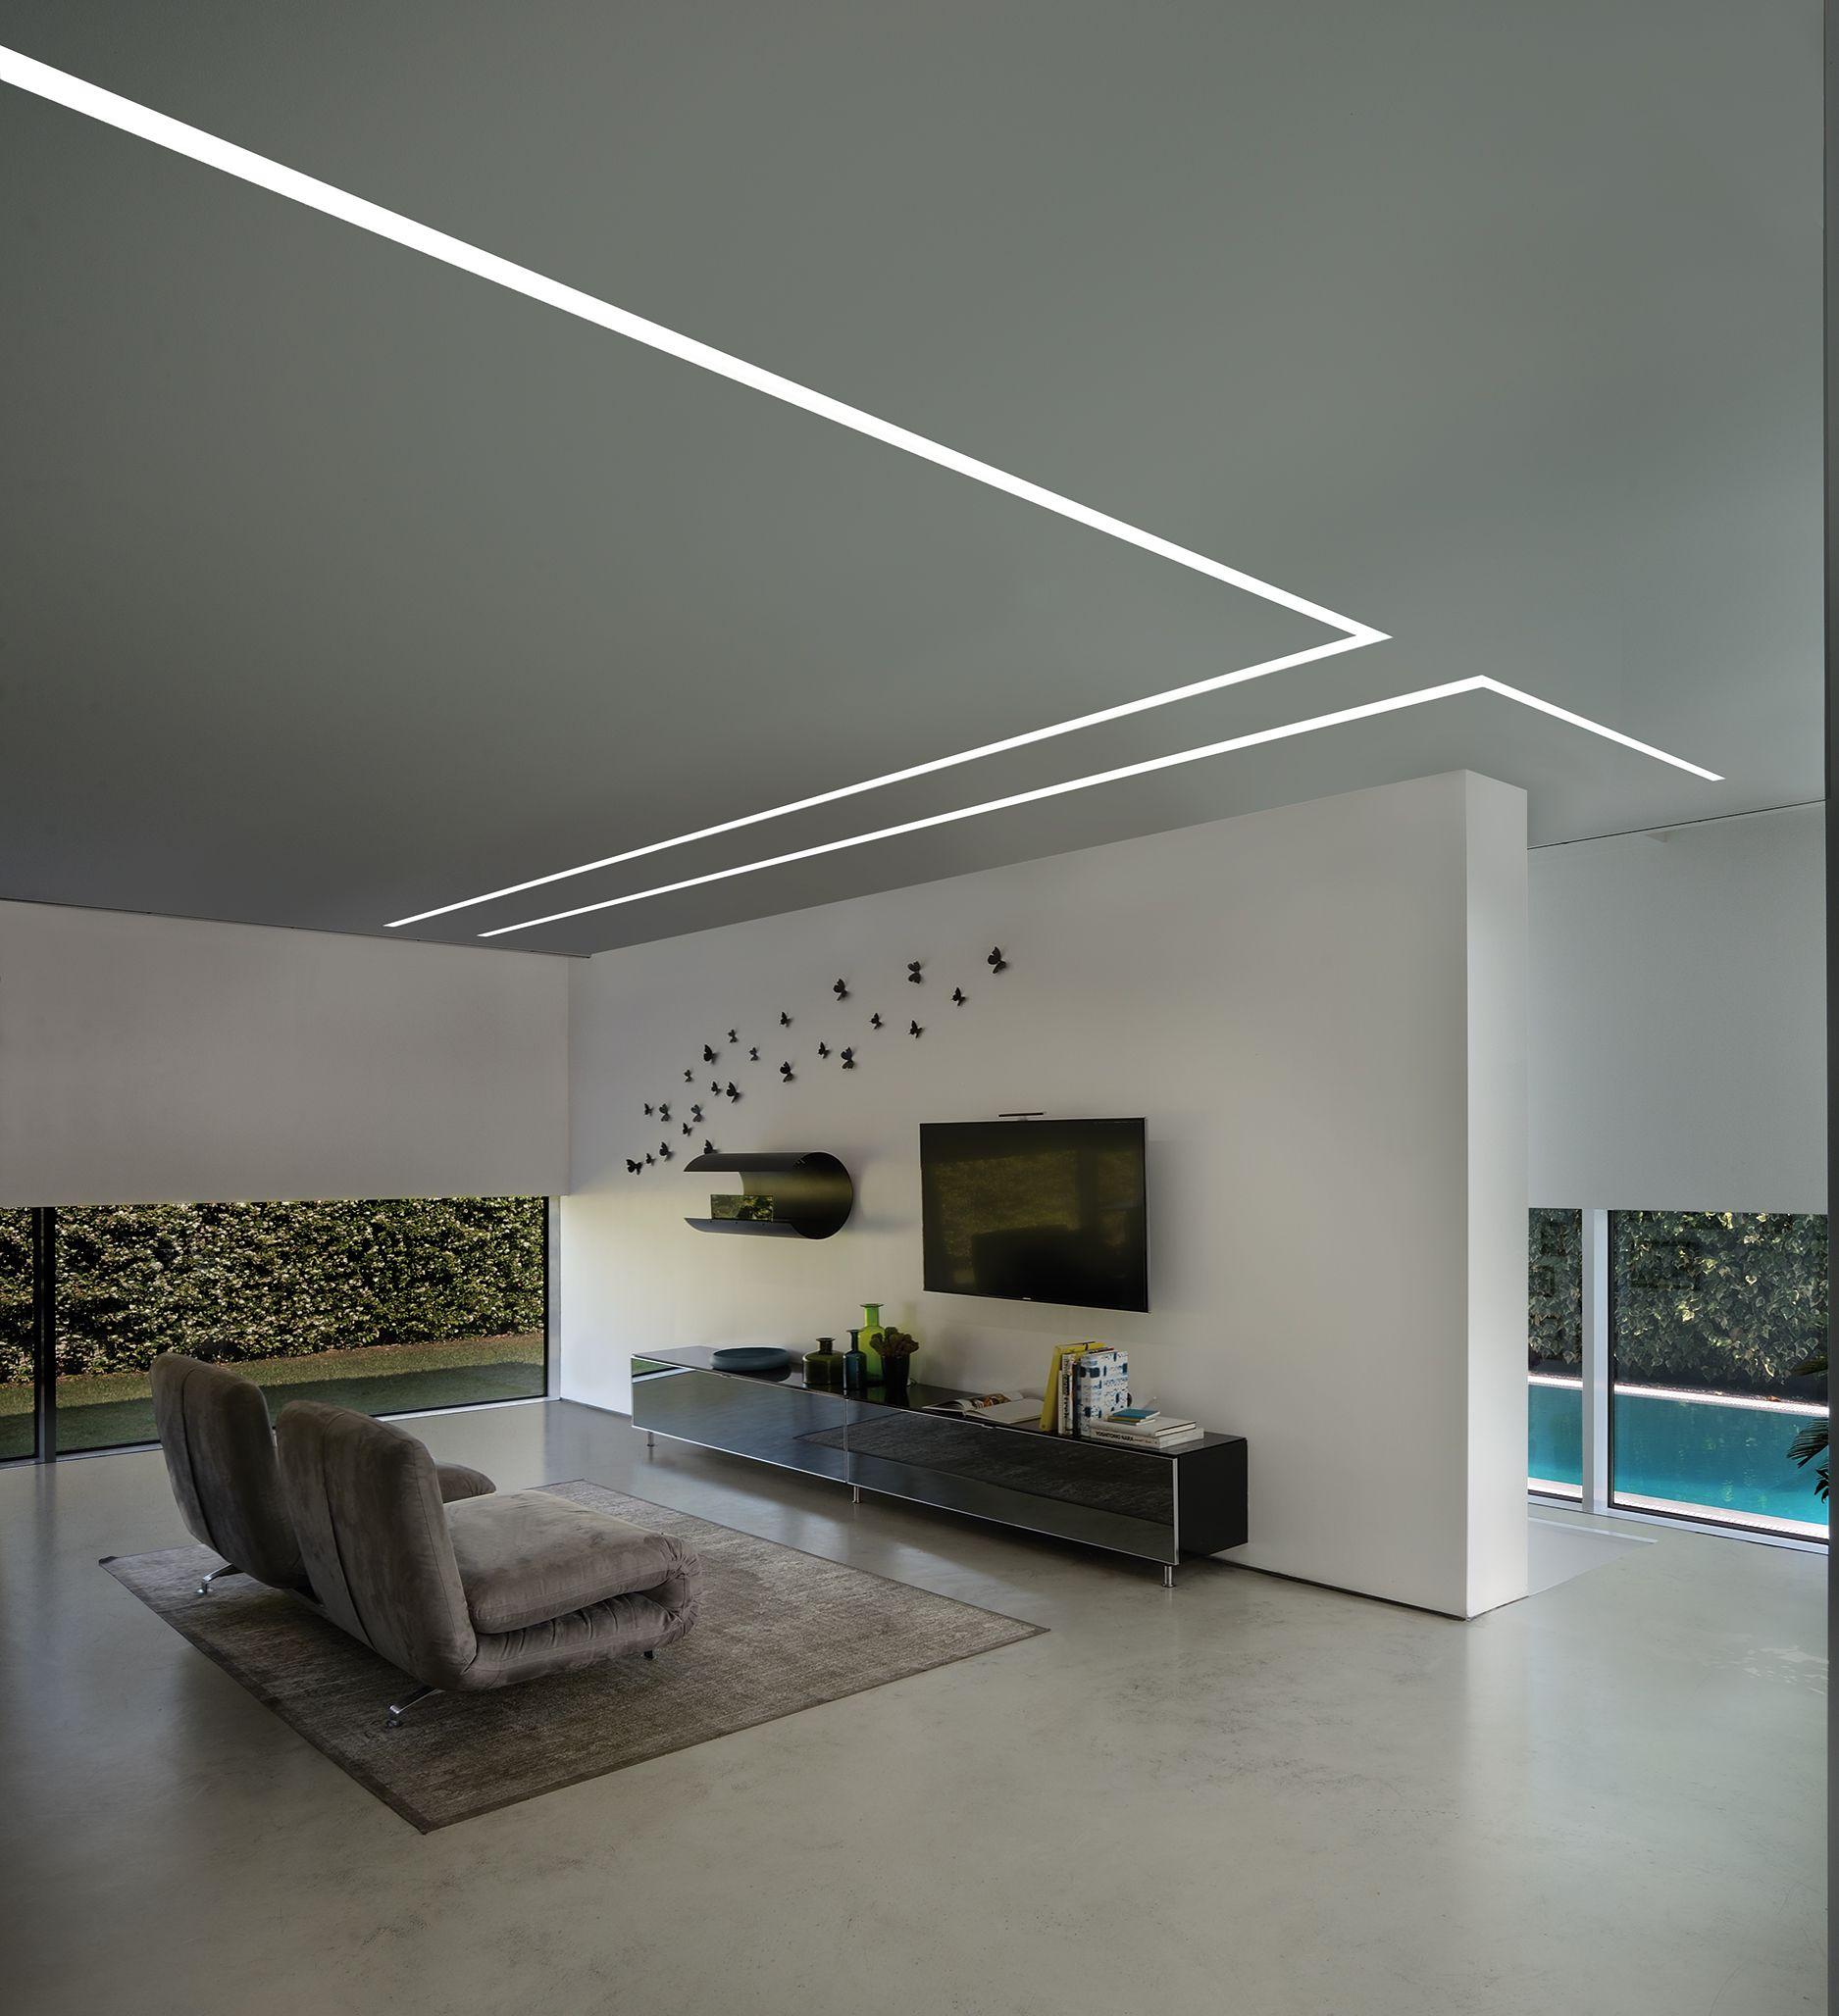 Brenta by L&L Luce&Light | Ceiling light design, Ceiling